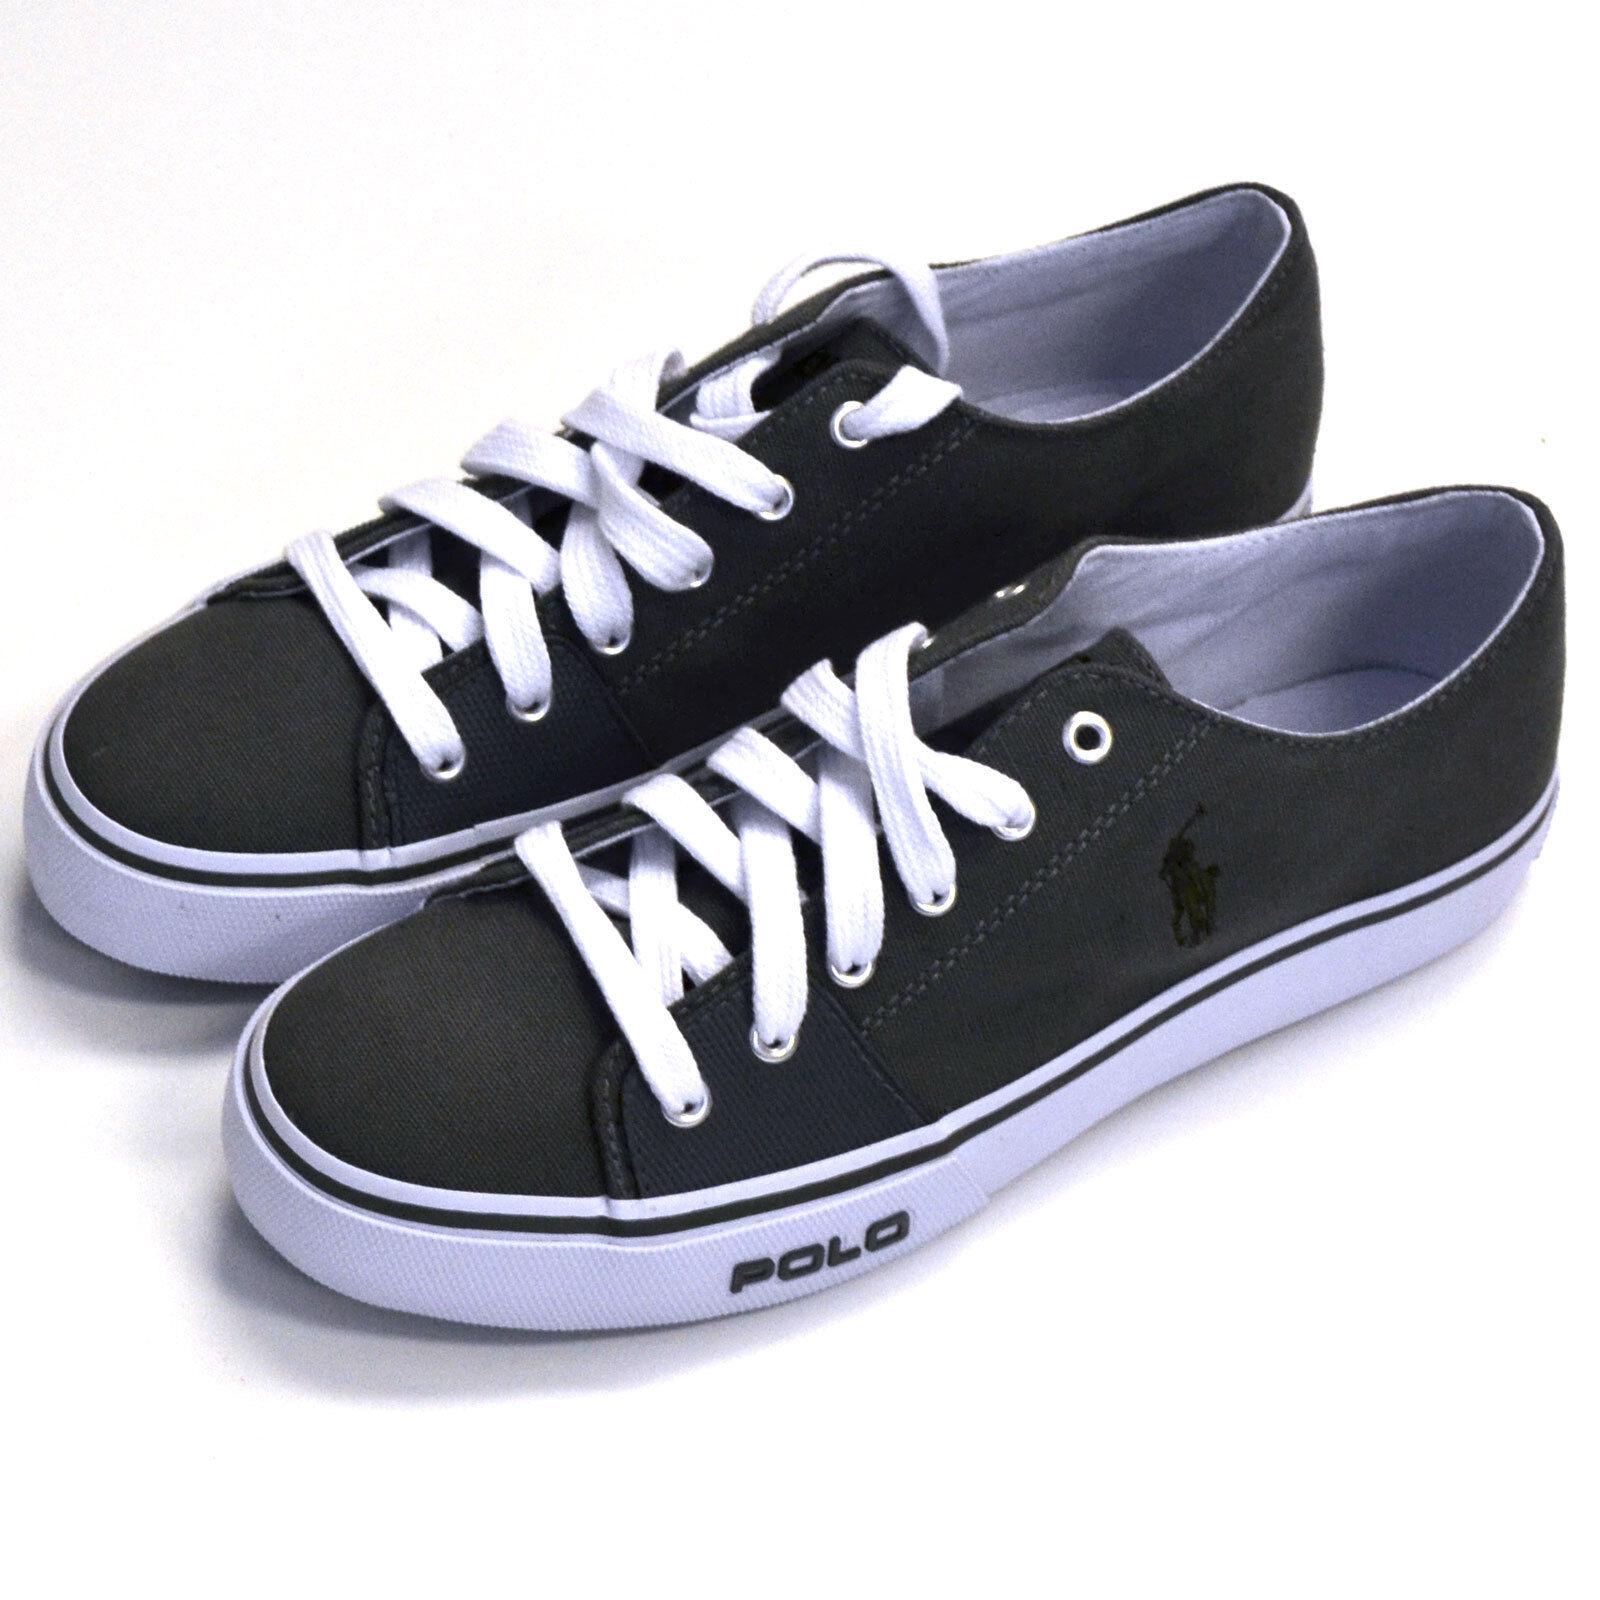 Polo Ralph Lauren shoes Mens Tennis shoes Canvas Sneakers Pony Logo 8 10.5 Prl